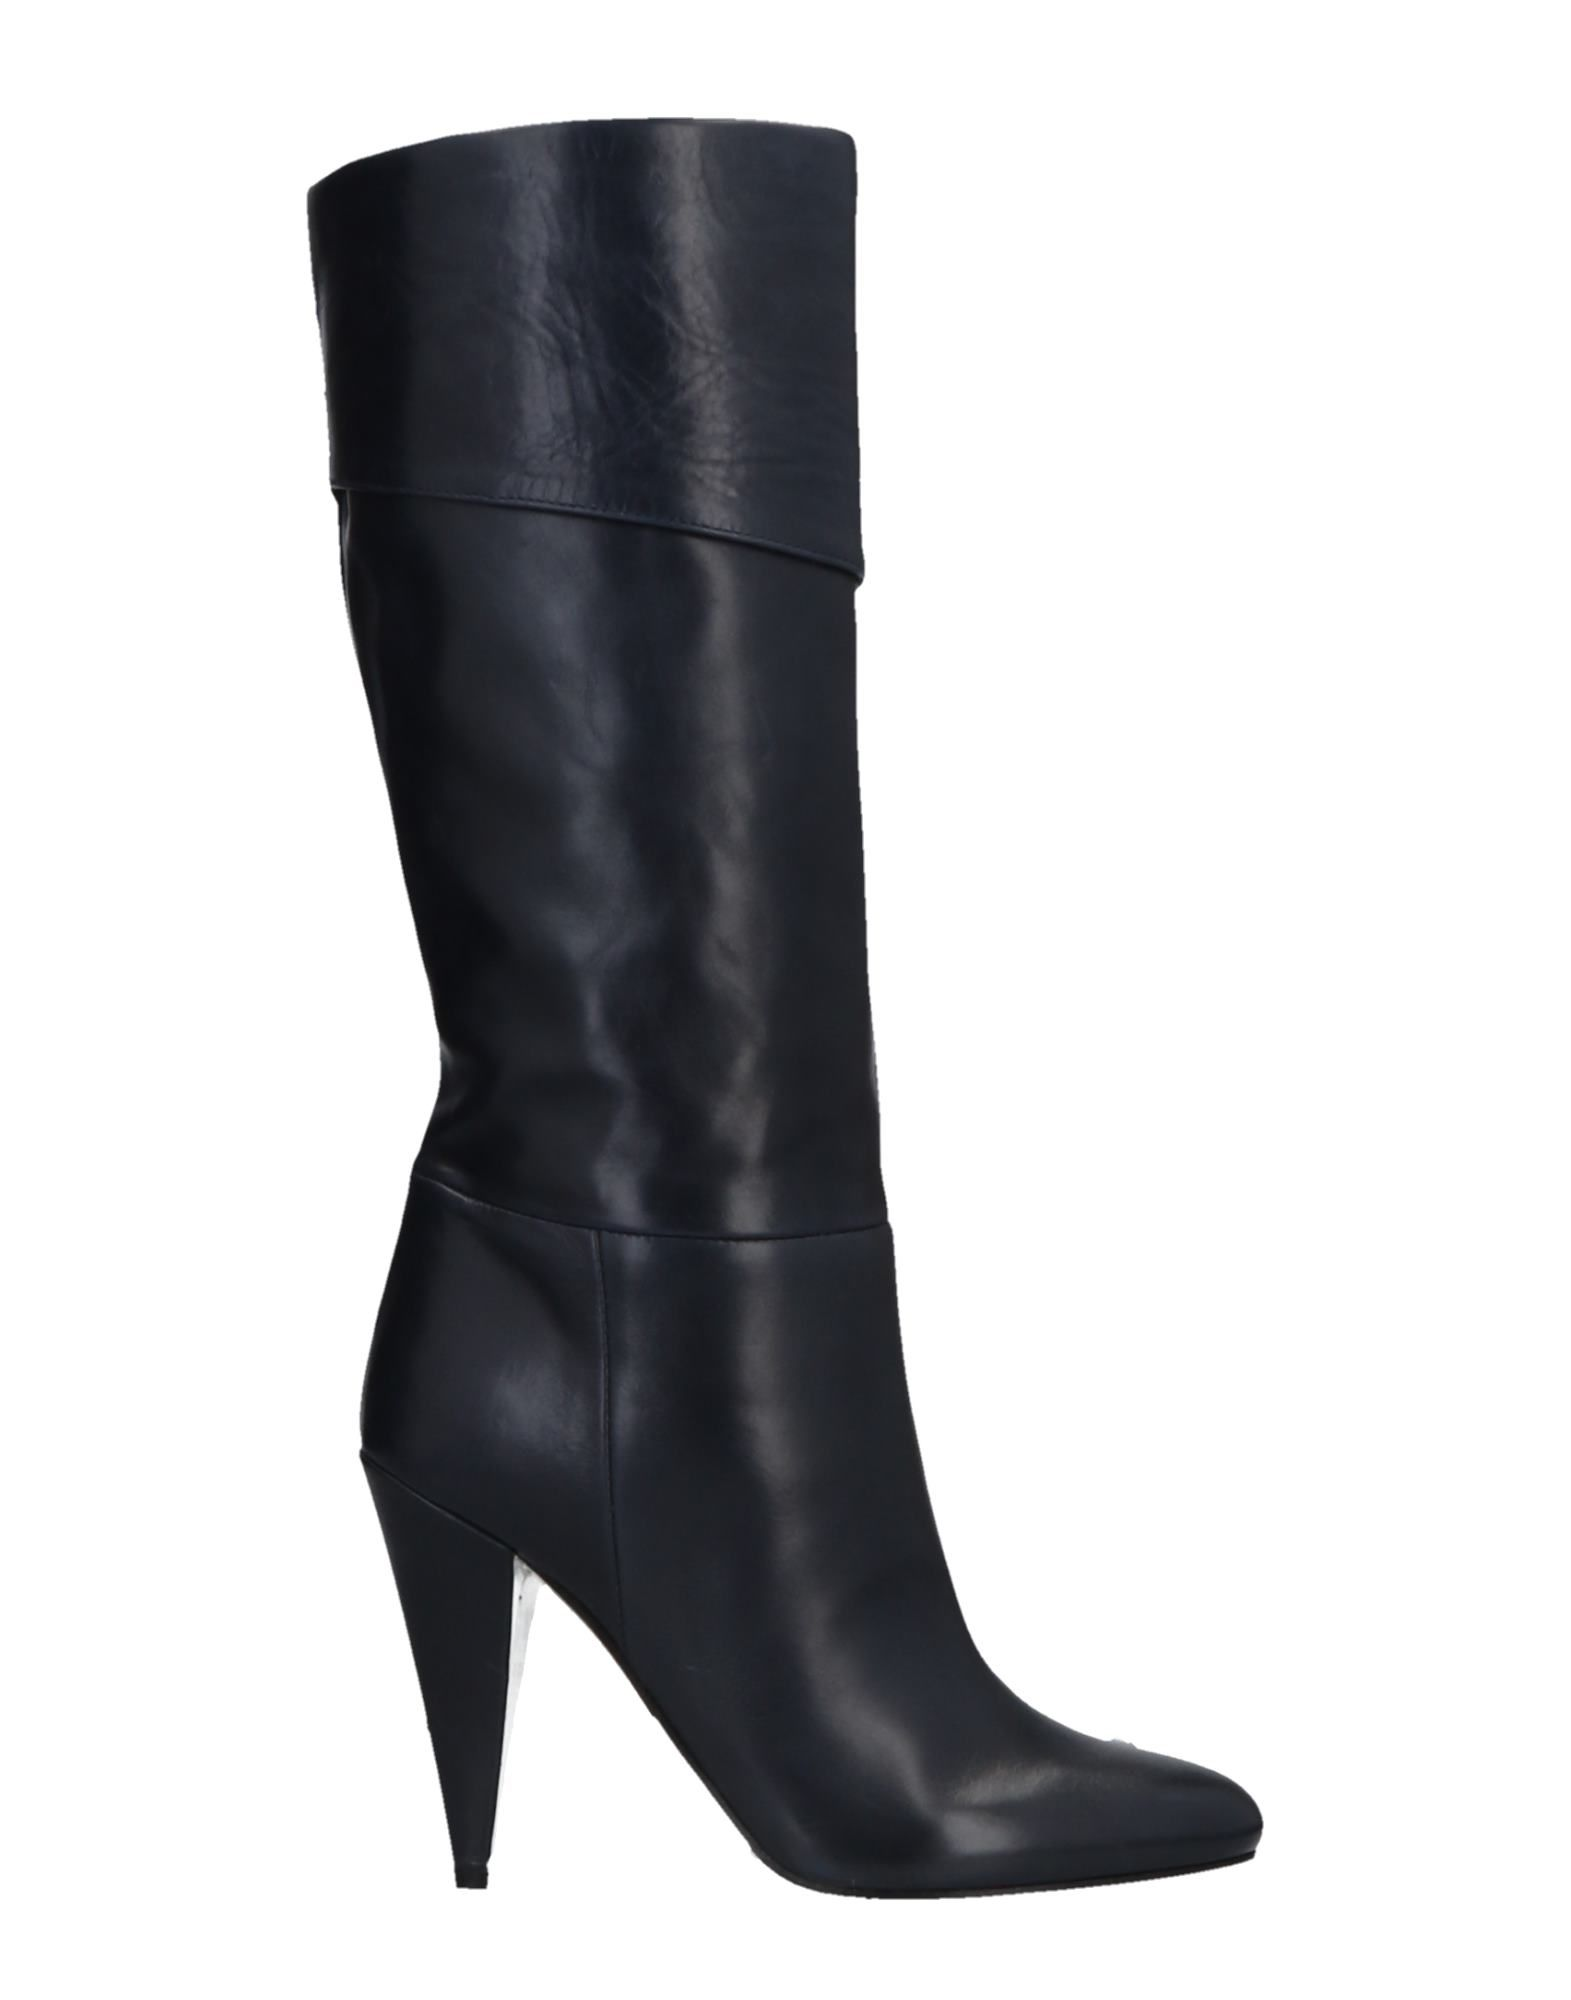 Rodolphe Menudier Menudier Boots - Women Rodolphe Menudier Menudier Boots online on  United Kingdom - 11516792RB 995628